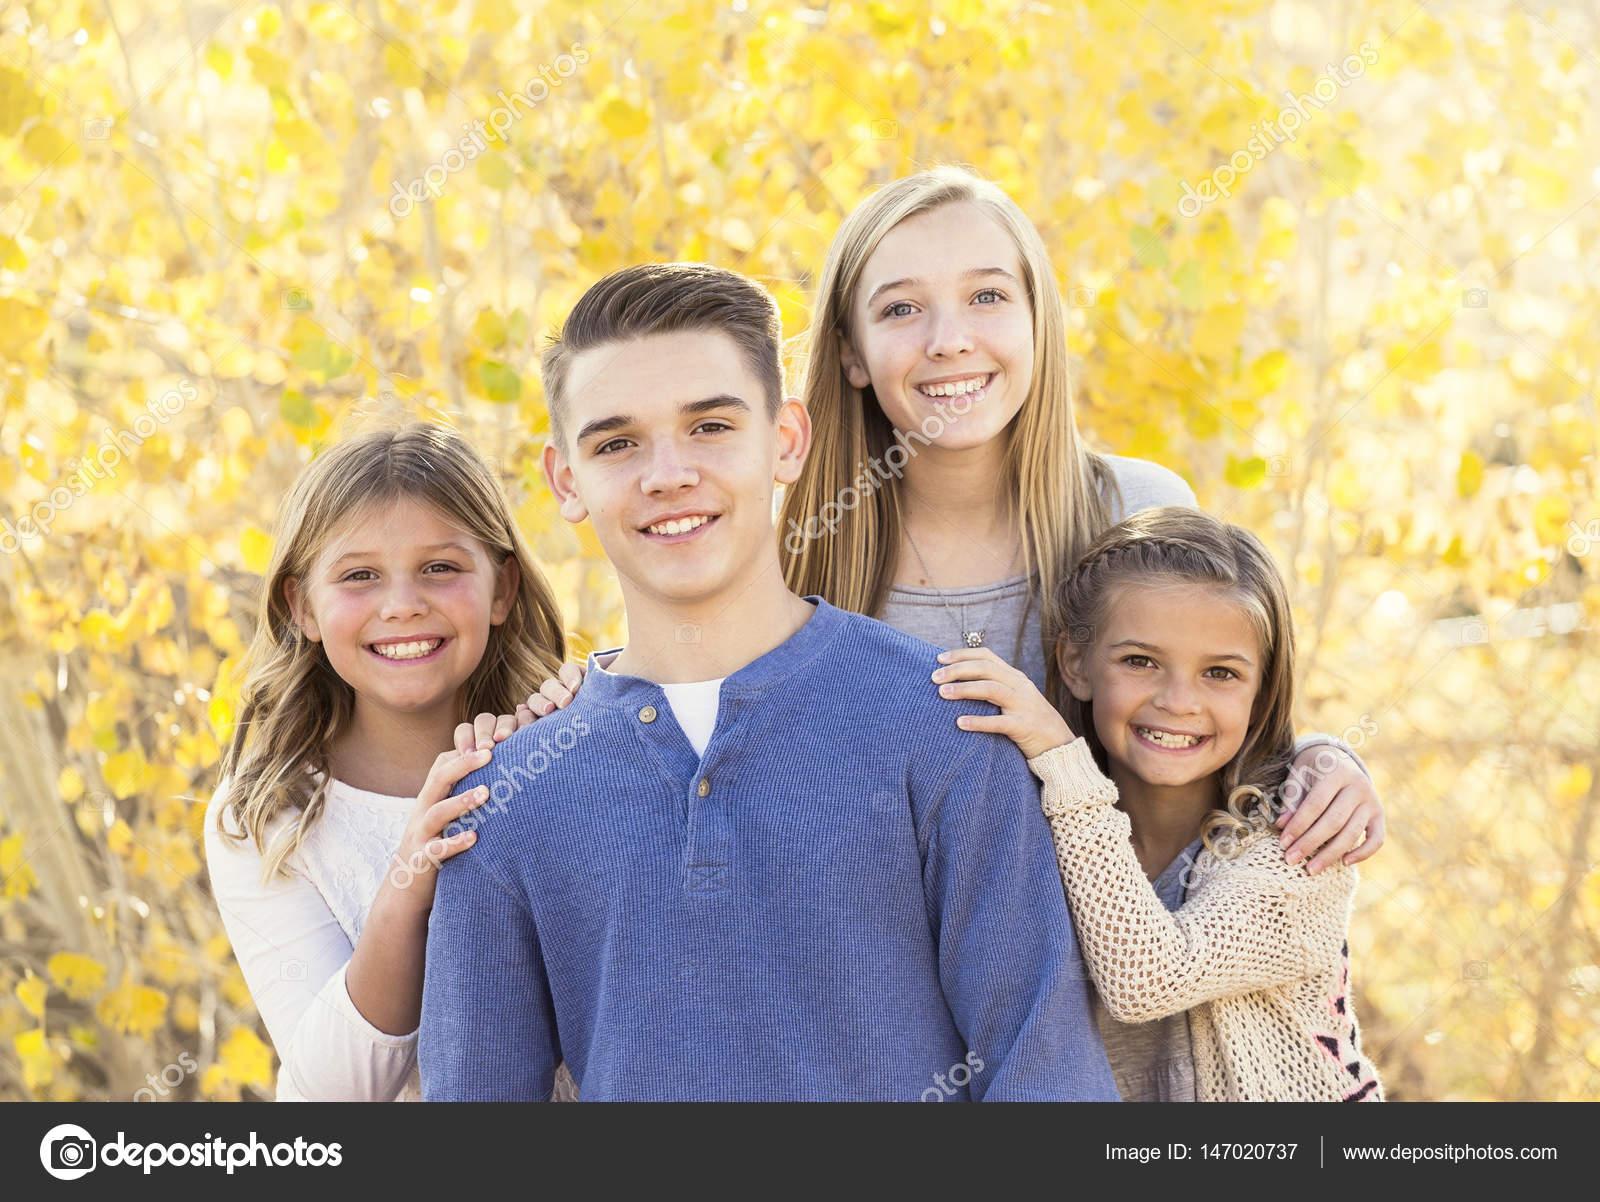 Adopting a Sibling Group